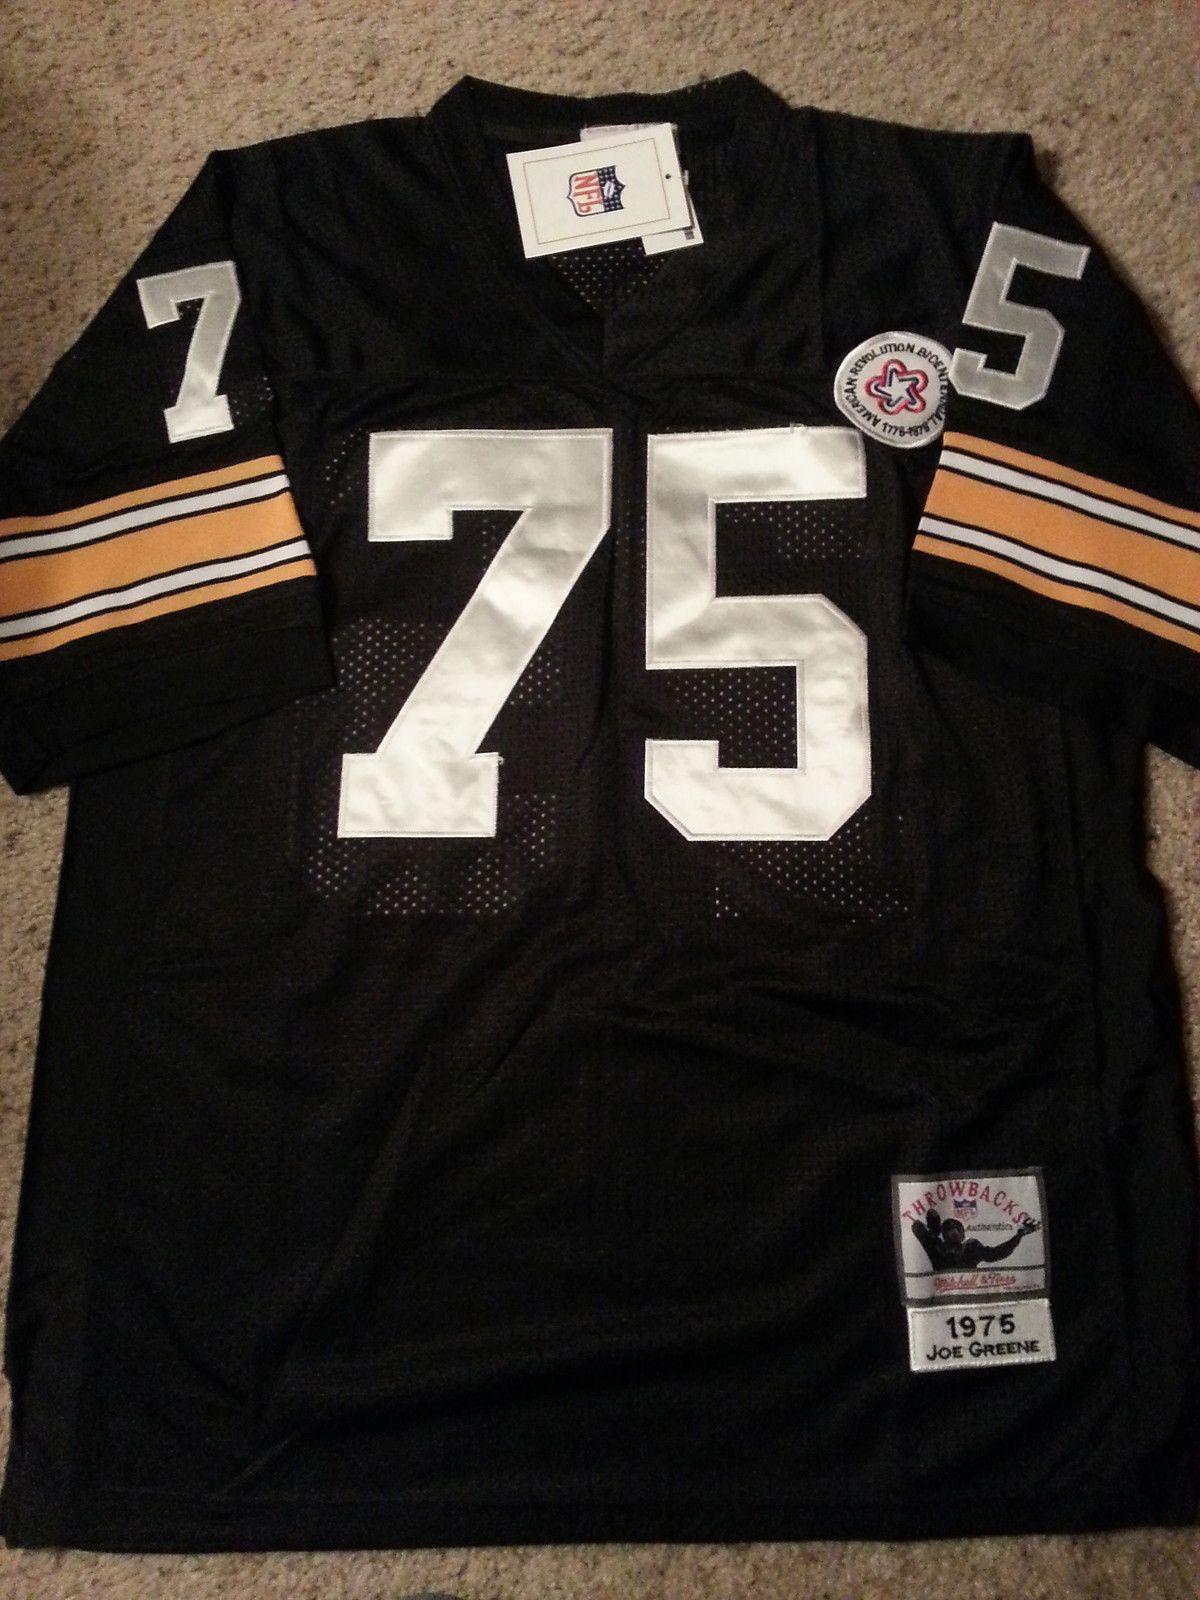 Joe Greene 1975 Throwback Jersey Size 52 Xl Sewn Stitched Steelers Joe Greene Throwback Steelers